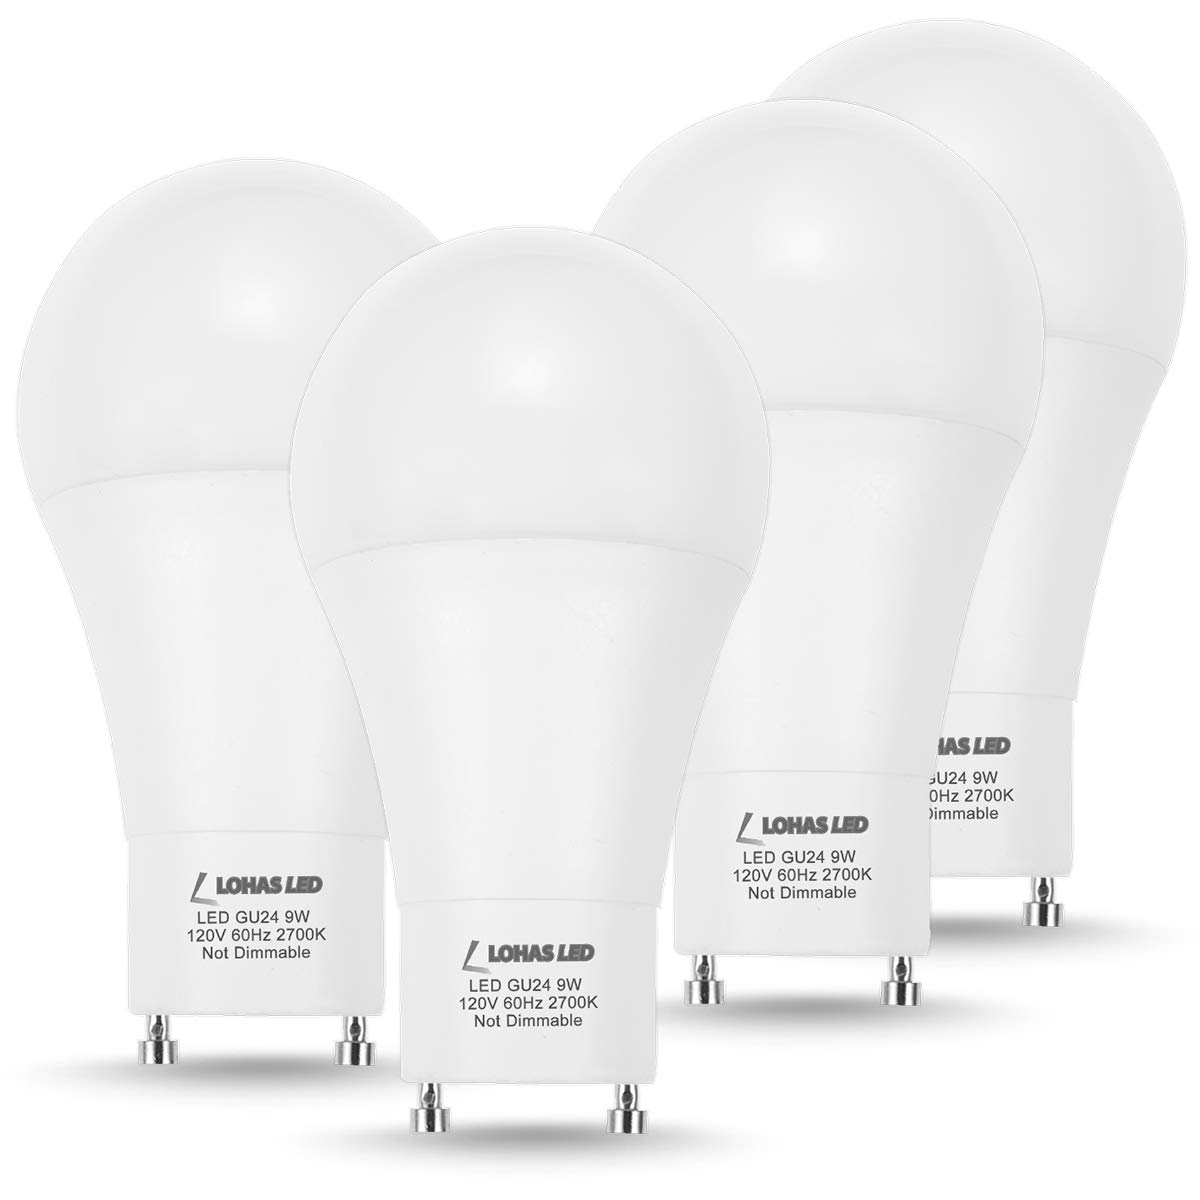 240 Degree Beam Angle 4 Pack Replace CFL Light Warm White Lighting 2700K A19 LED Light Bulb GU24 Base LOHAS GU24 Bulb 810LM LED Lamp 9W LED 60 Watt Equivalent